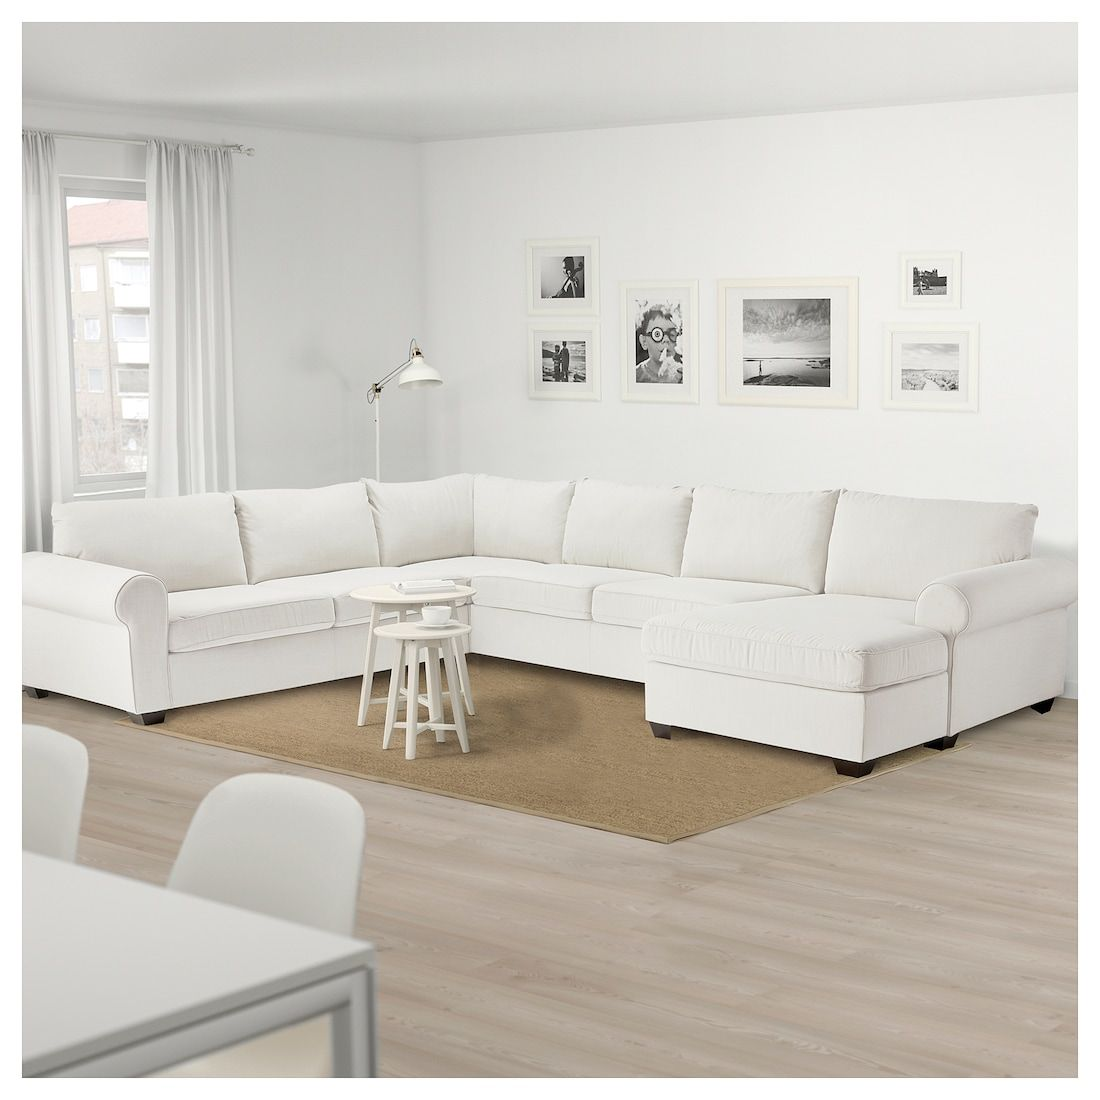 Ellestorp Sectional 4 Seat Corner With Chaise Left Nordvalla Beige Ikea Corner Sofa Design Sectional Sofa Modern Sofa Living Room